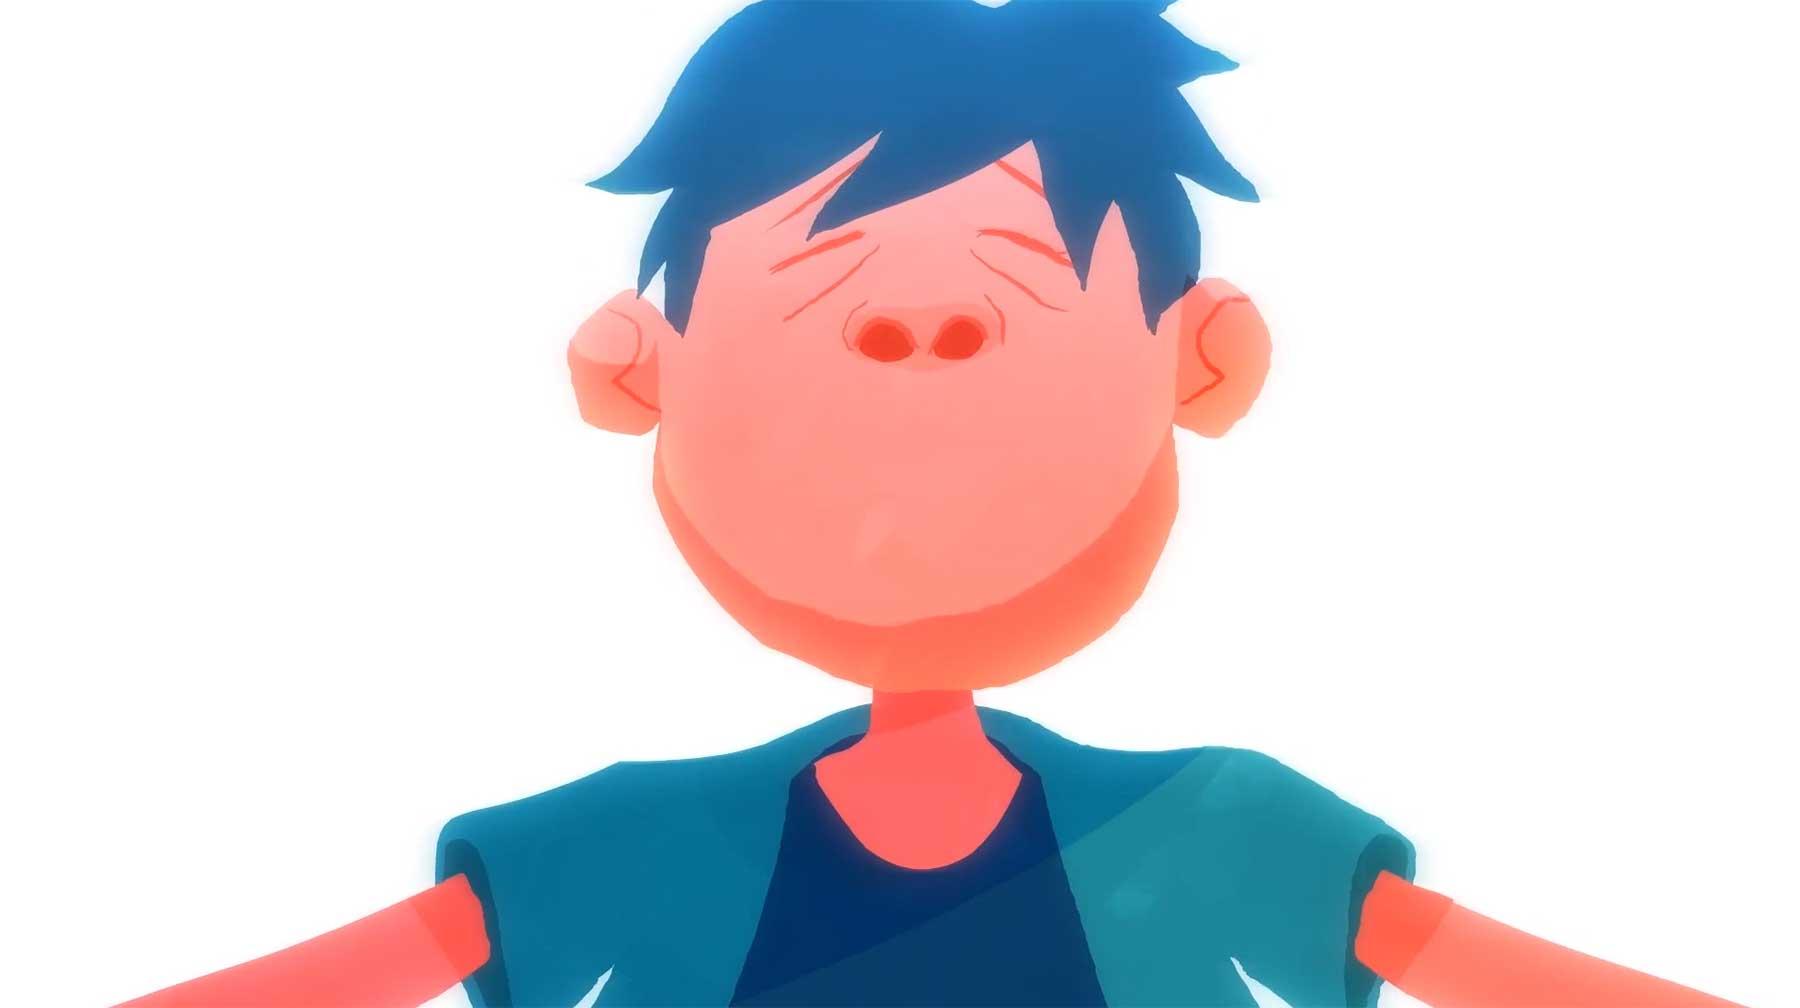 Das animierte Leben zweier Nasenlöcher